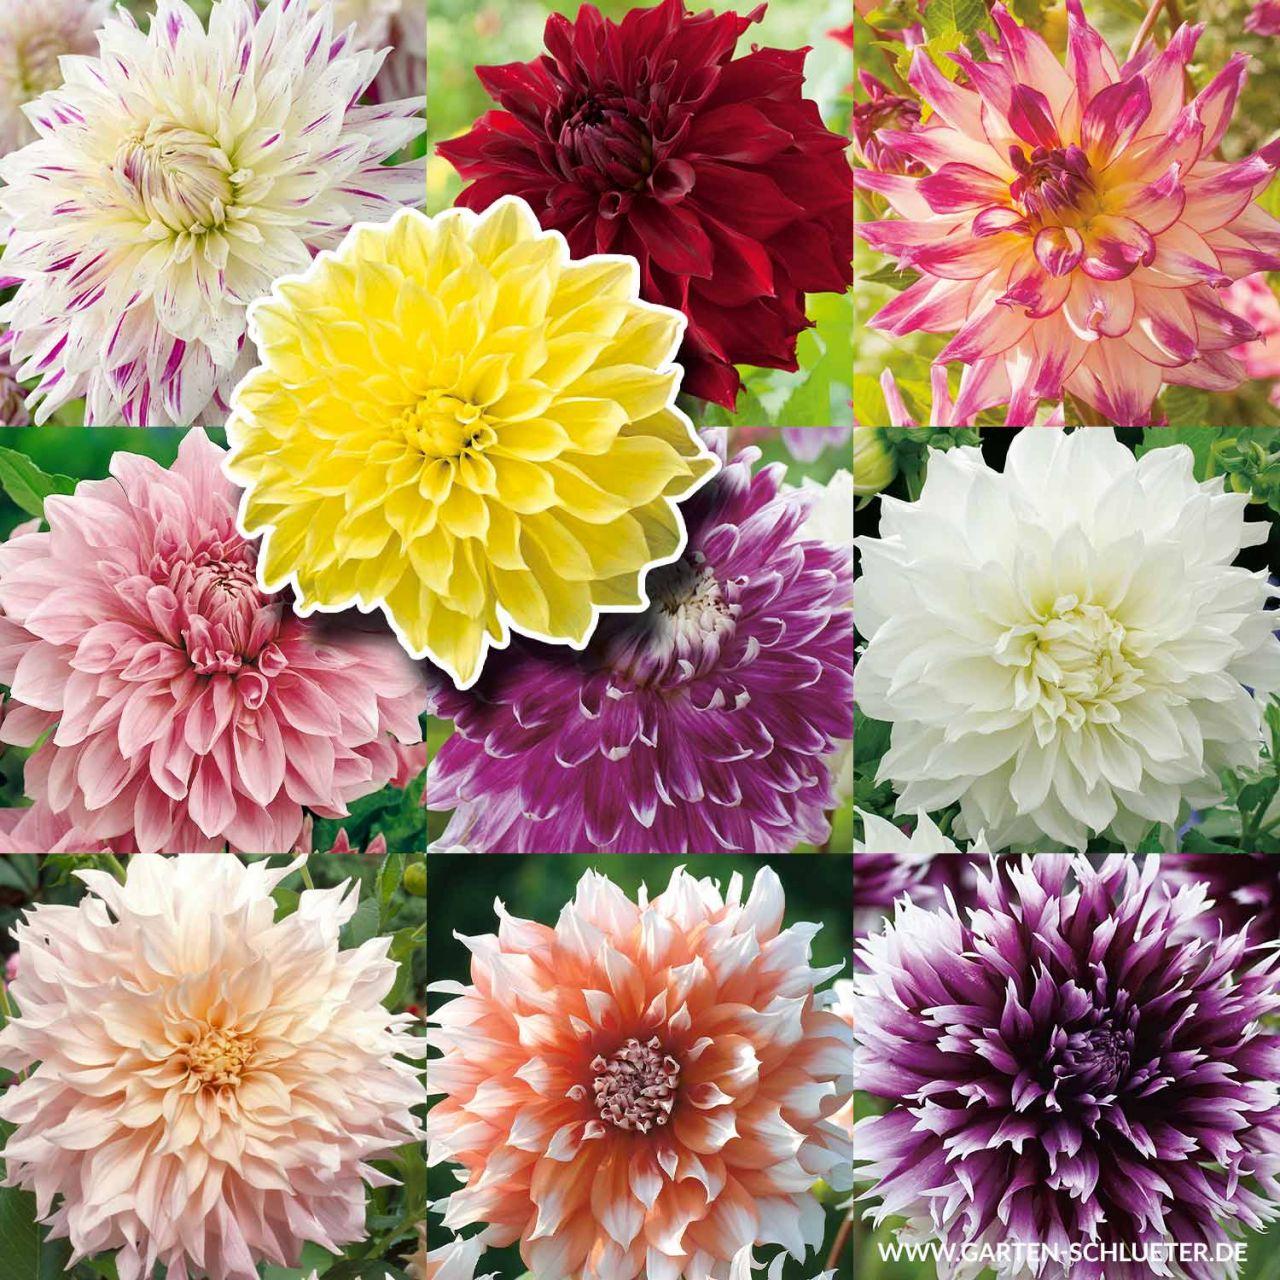 Kollektion Großblumige Dahlien - 10 Sorten